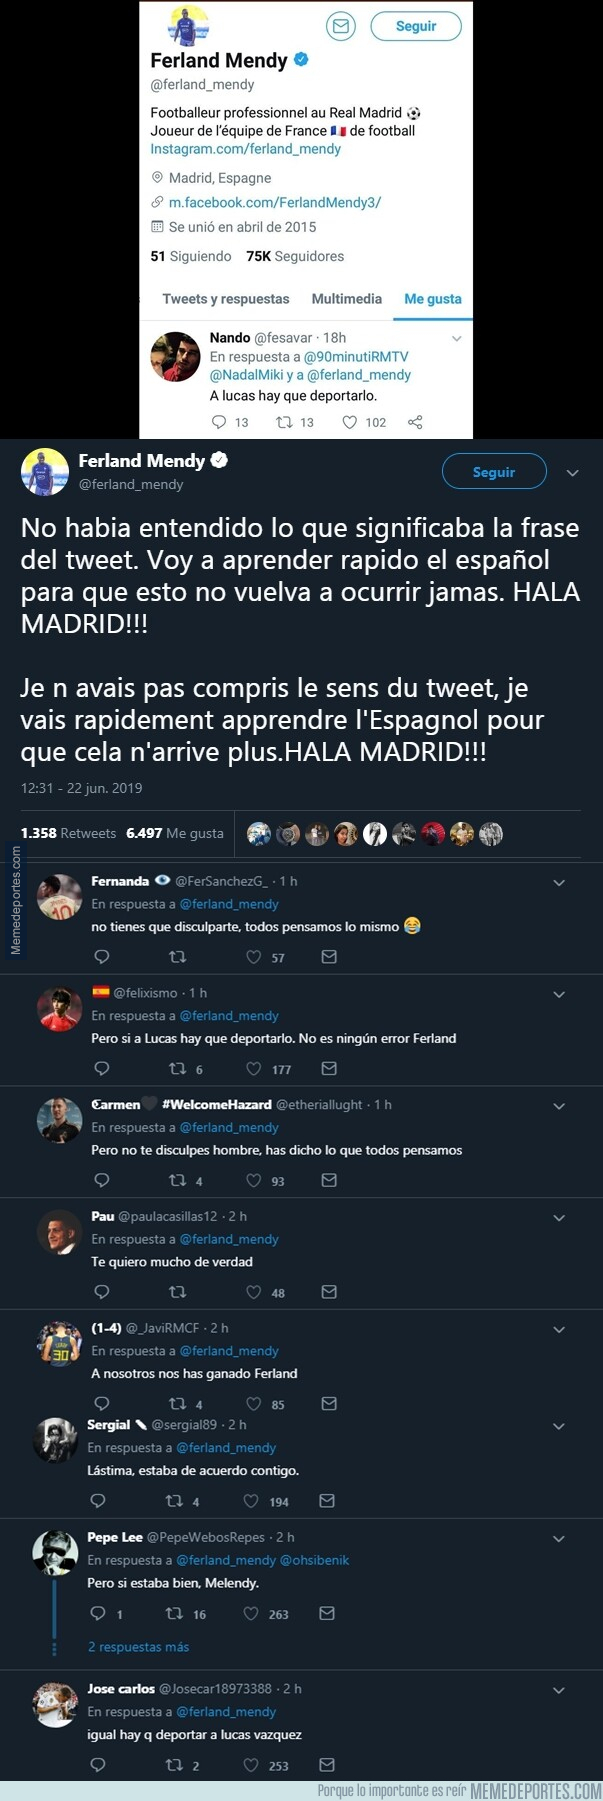 1078991 - La pequeña anécdota twittera que le pasó a Mendy por no saber español